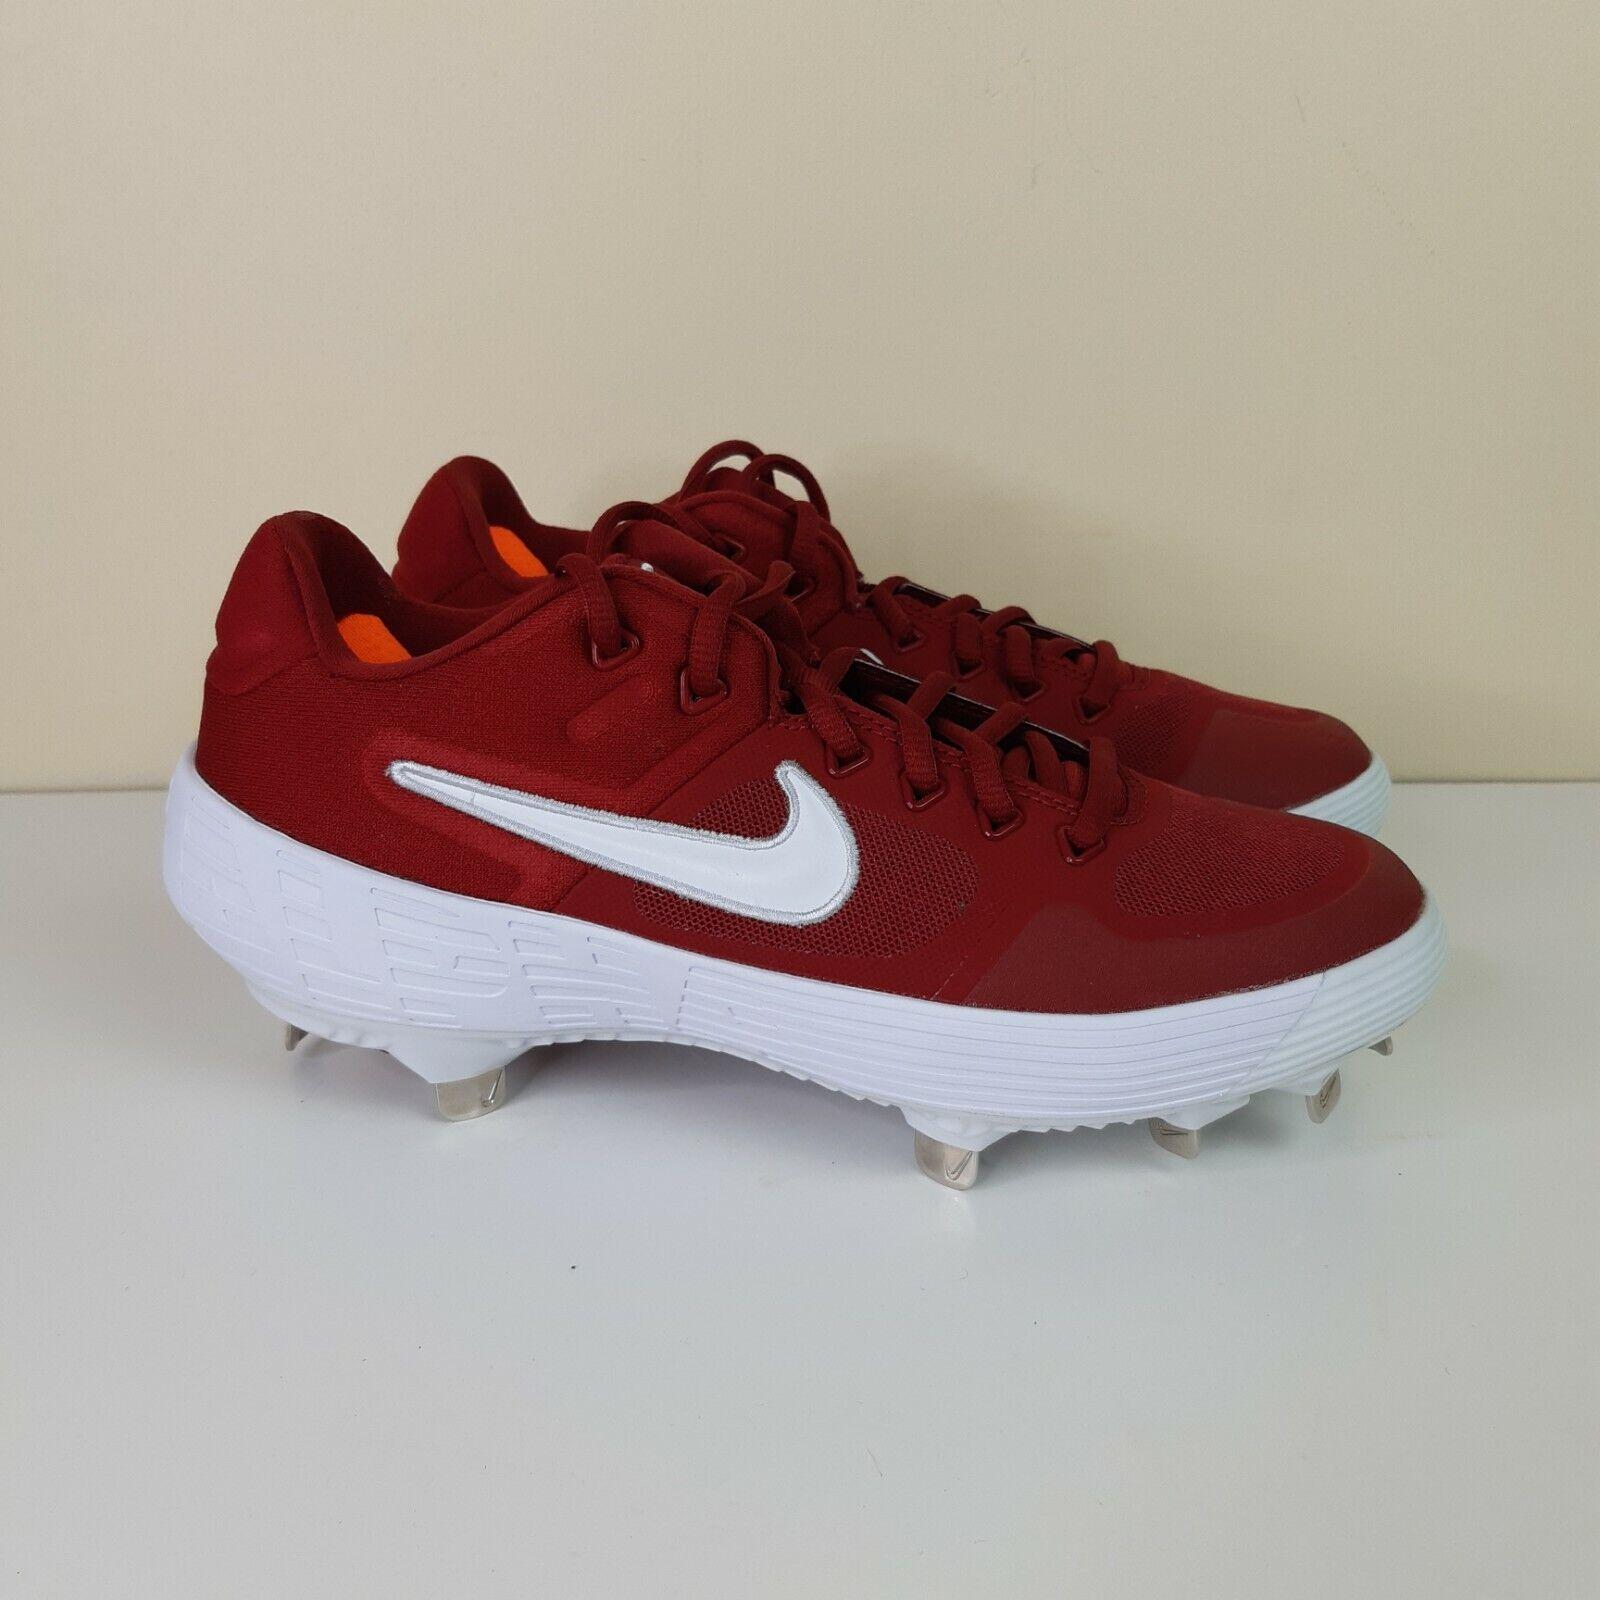 NEW Nike Men's Alpha Huarache Elite 2 Low Baseball Cleats Size 6 [AJ6873-602]